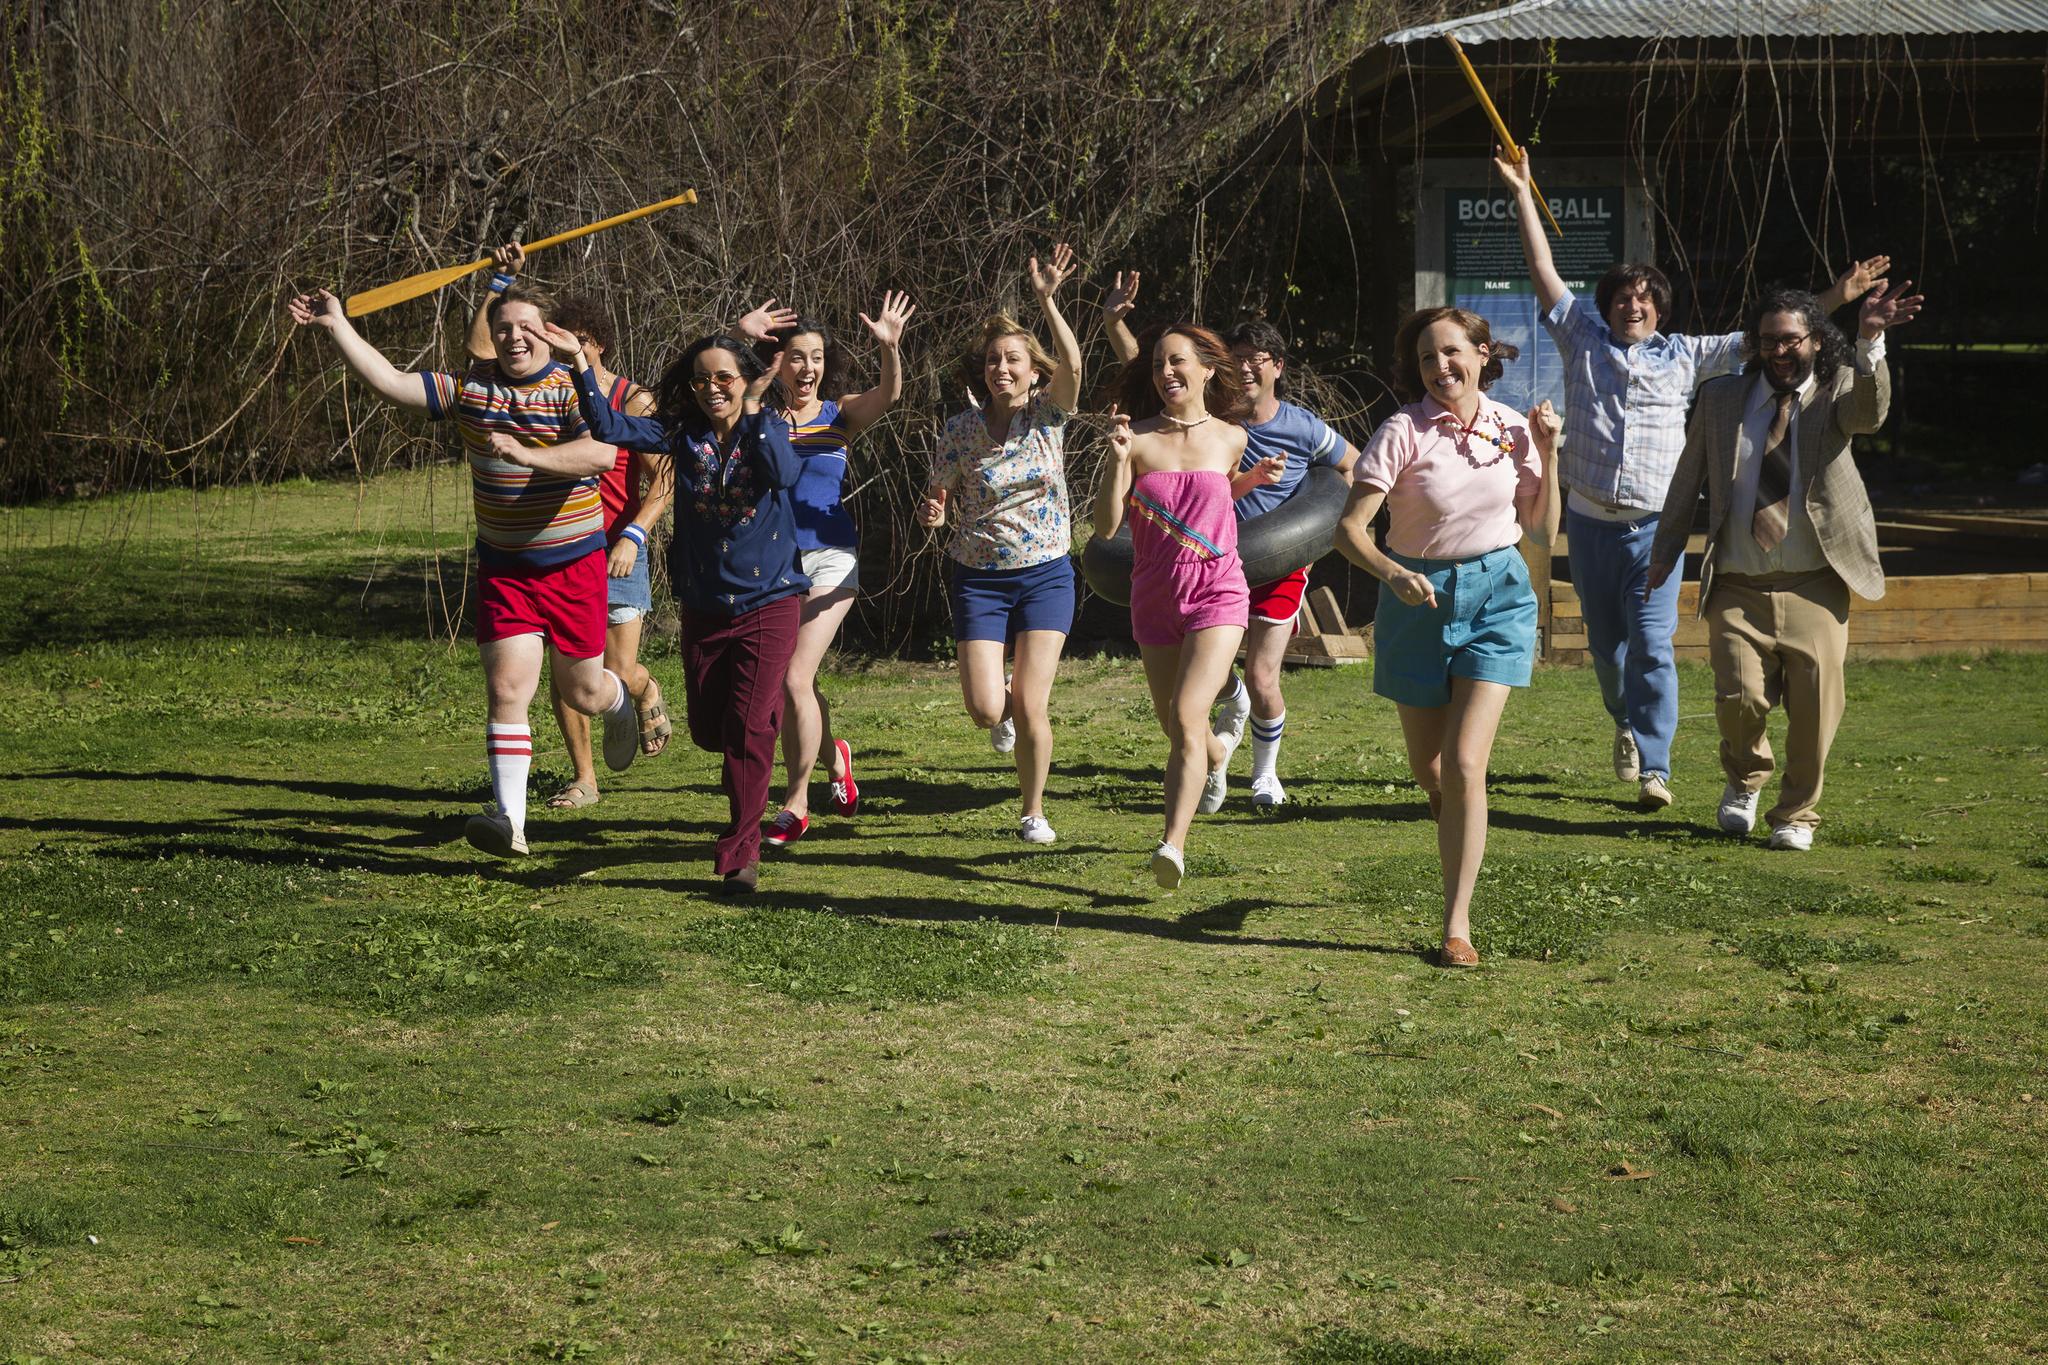 Judah Friedlander, Nina Hellman, Joe Lo Truglio, Molly Shannon, and Michael Showalter in Wet Hot American Summer: First Day of Camp (2015)